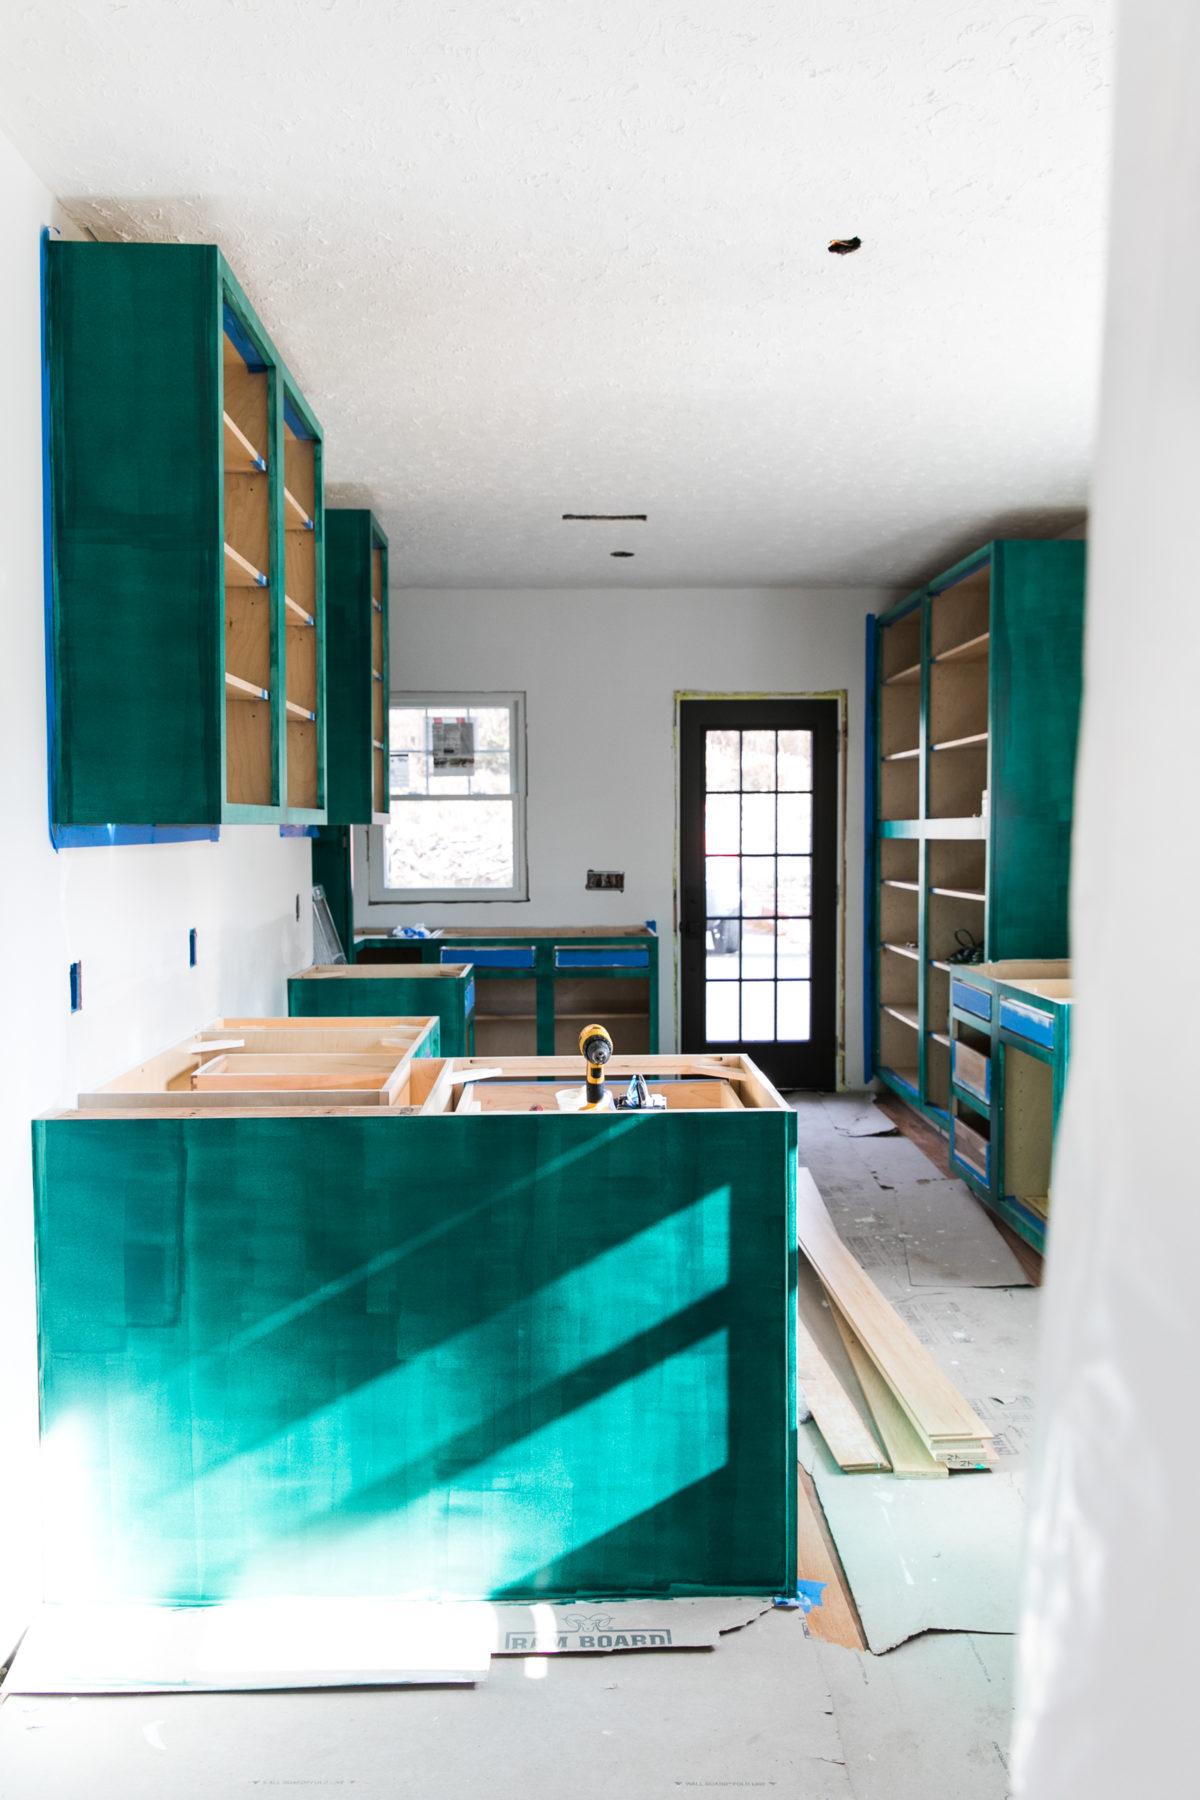 One Room Challenge | Green Kitchen Glamazon | Kitchen Mood Board | Open Kitchen Design | Kitchen Renovation | Jessica Brigham | Magazine Ready for Life | www.jessicabrigham.com